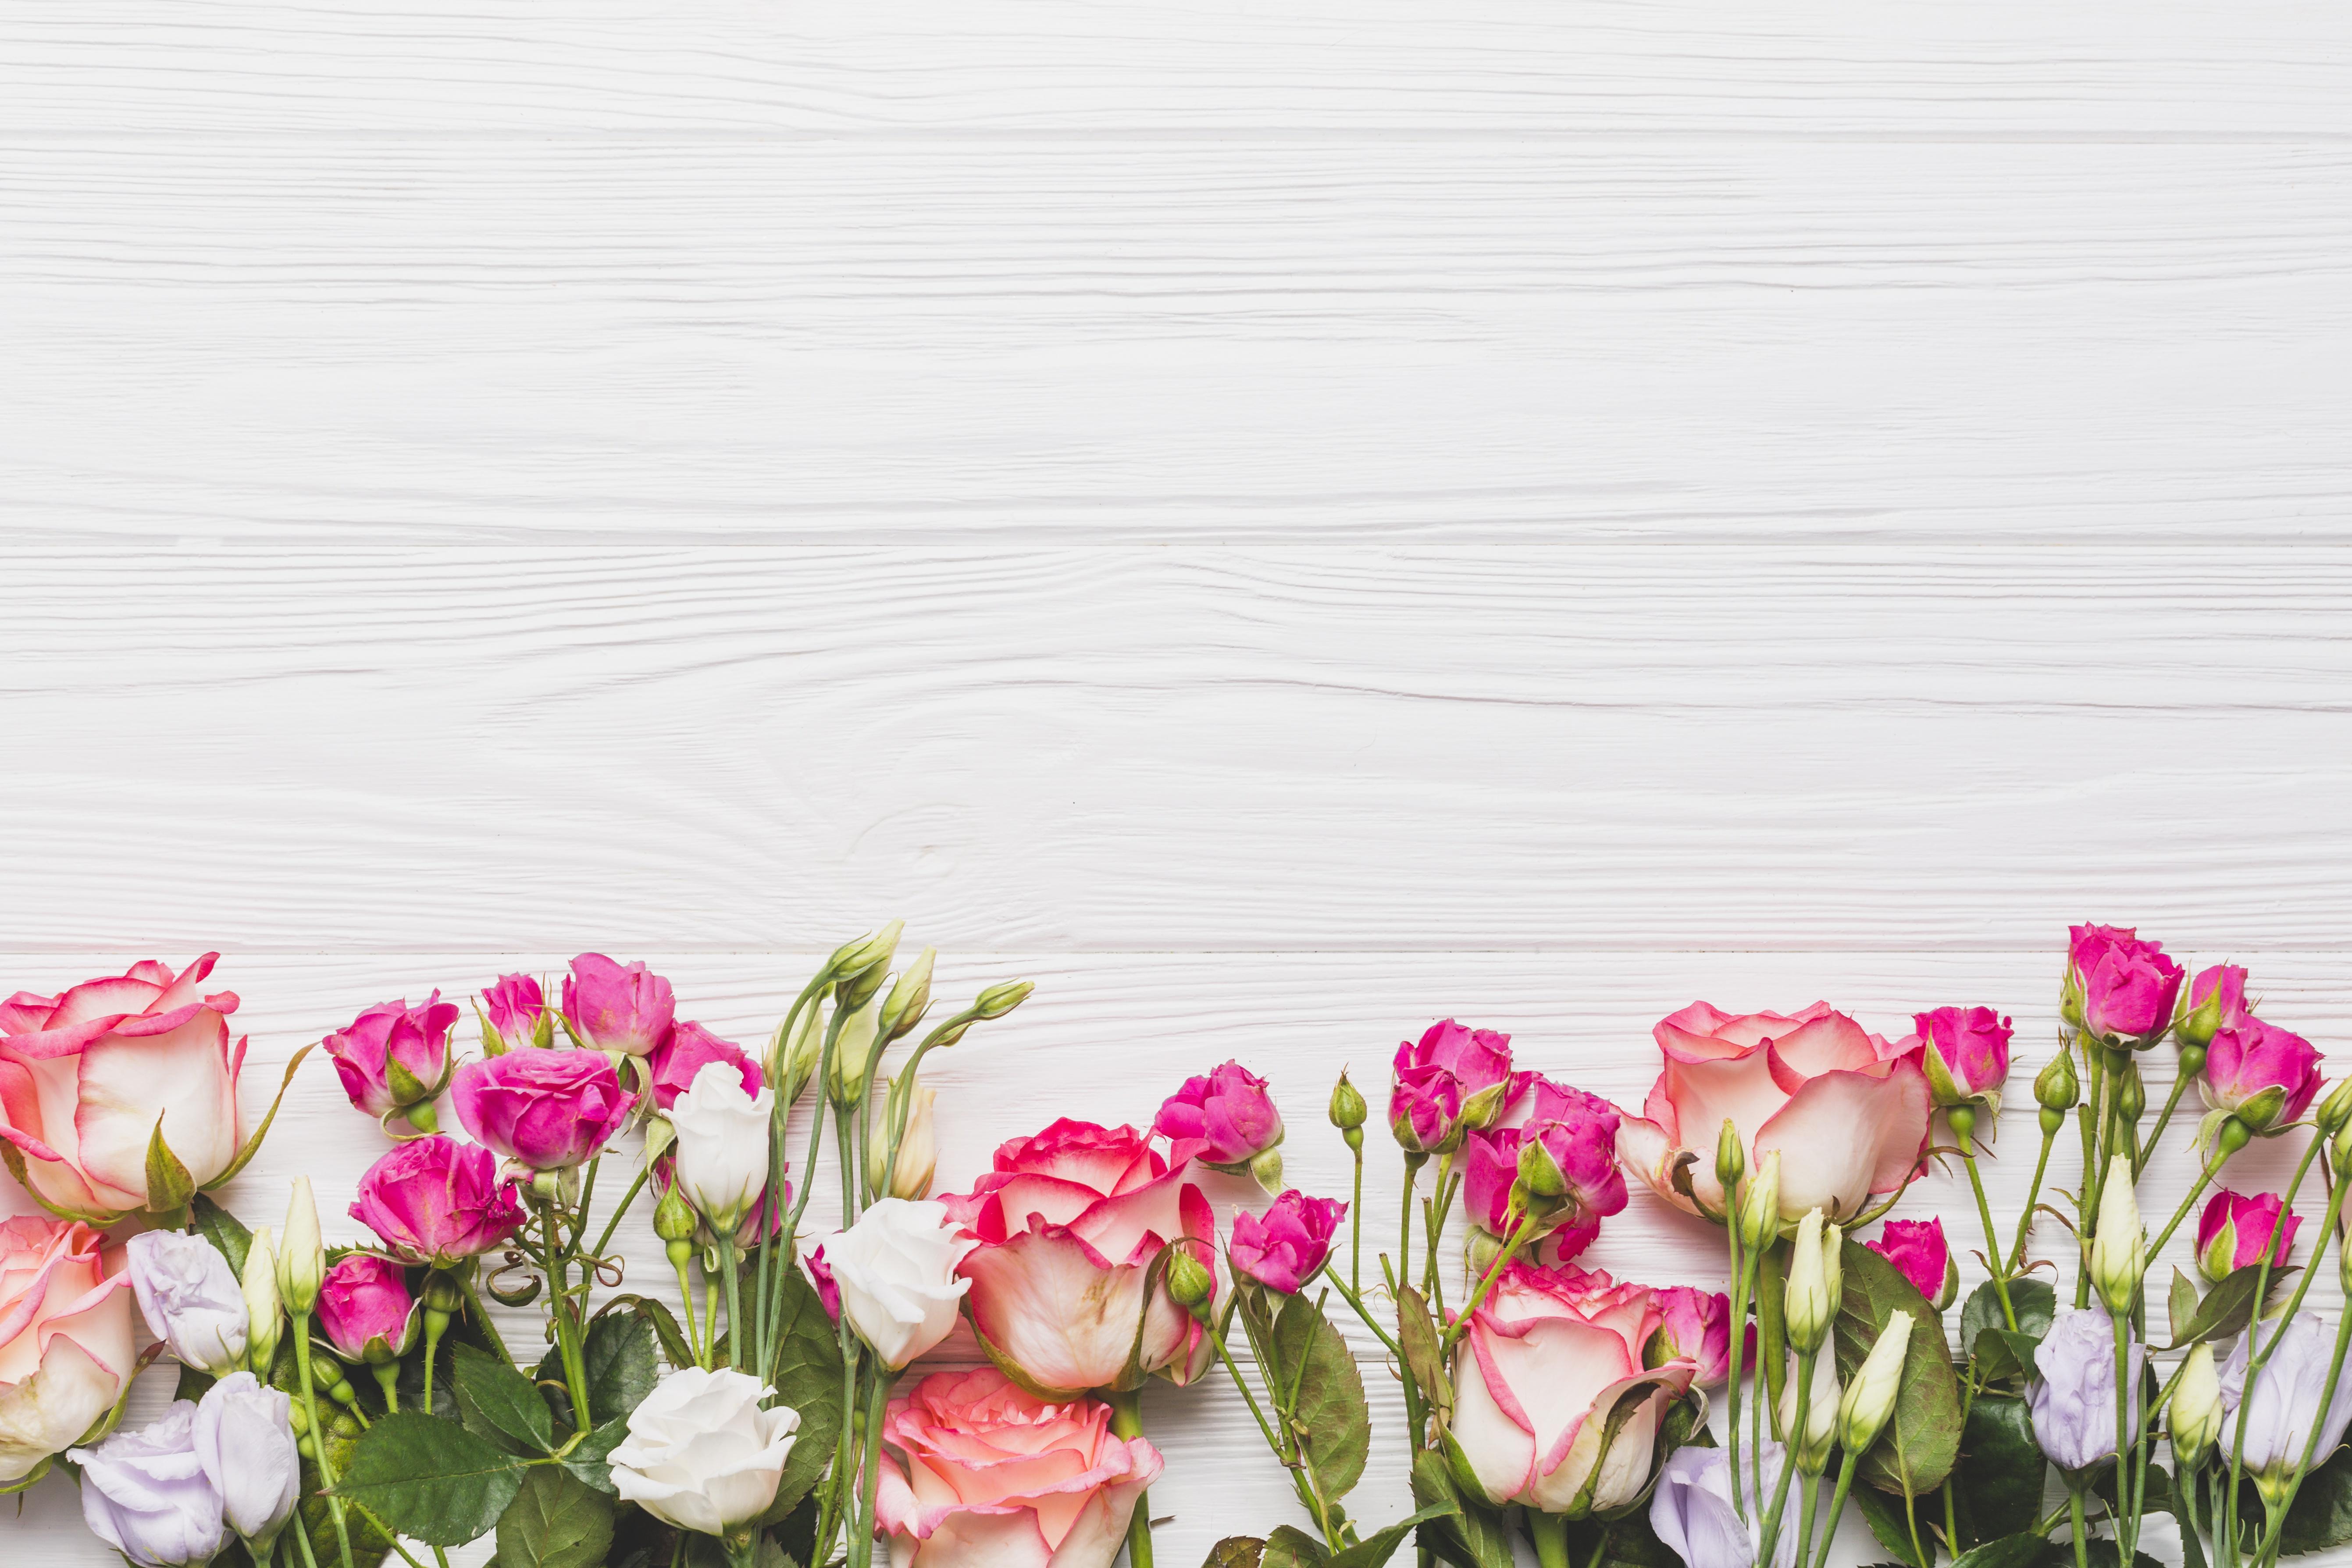 Картинка фон цветы снизу